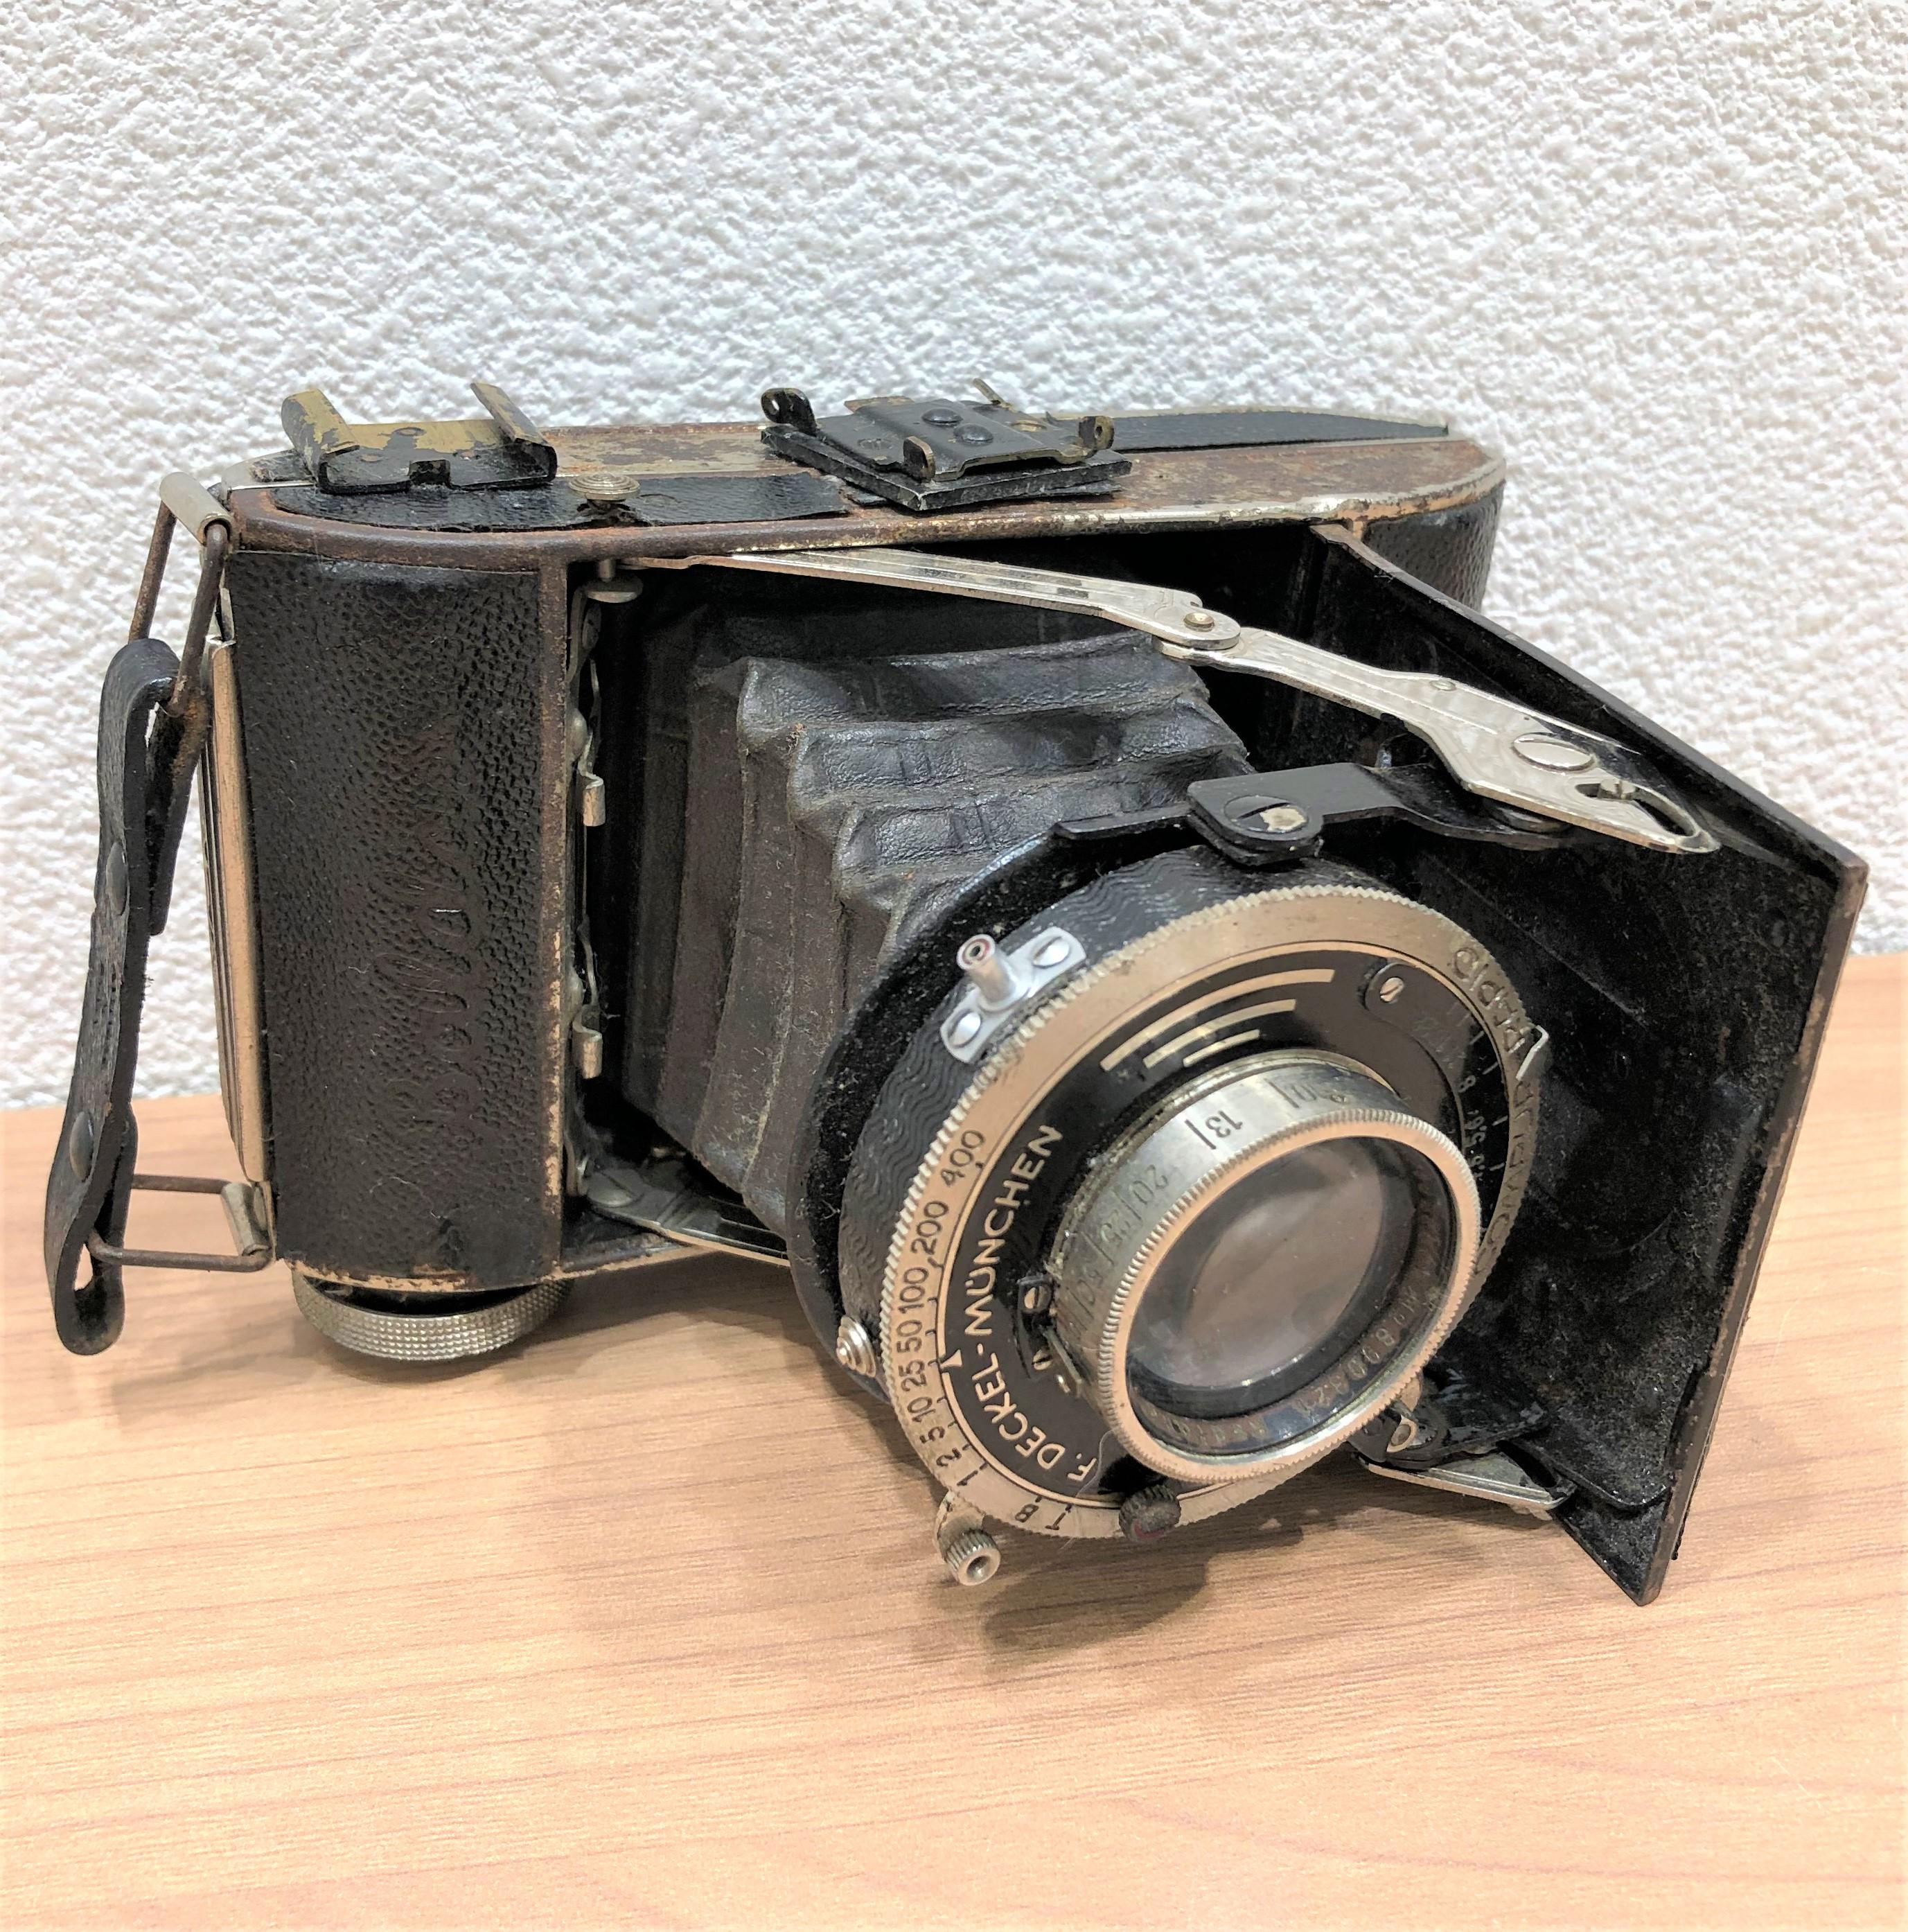 【BALDAX/バルダ】F.DECKEL-MUNCHEN COMPUR-RAPID カメラ